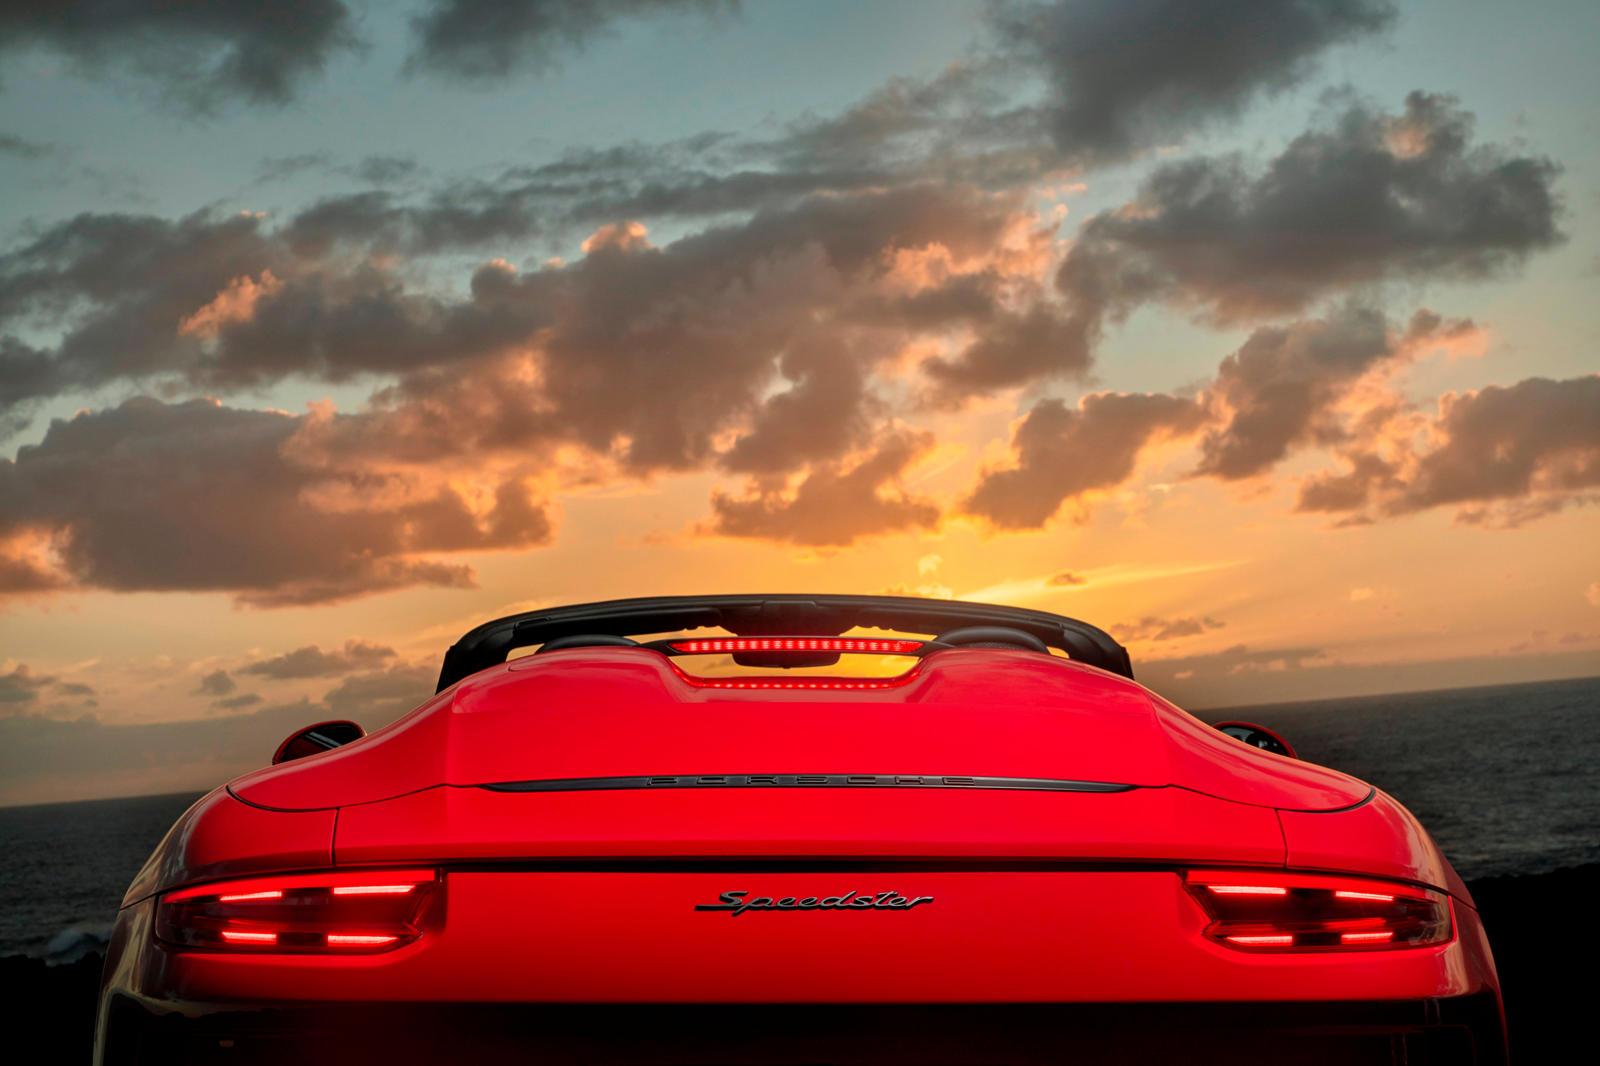 85579 Porsche Promises It'll Never Do What Bugatti Does